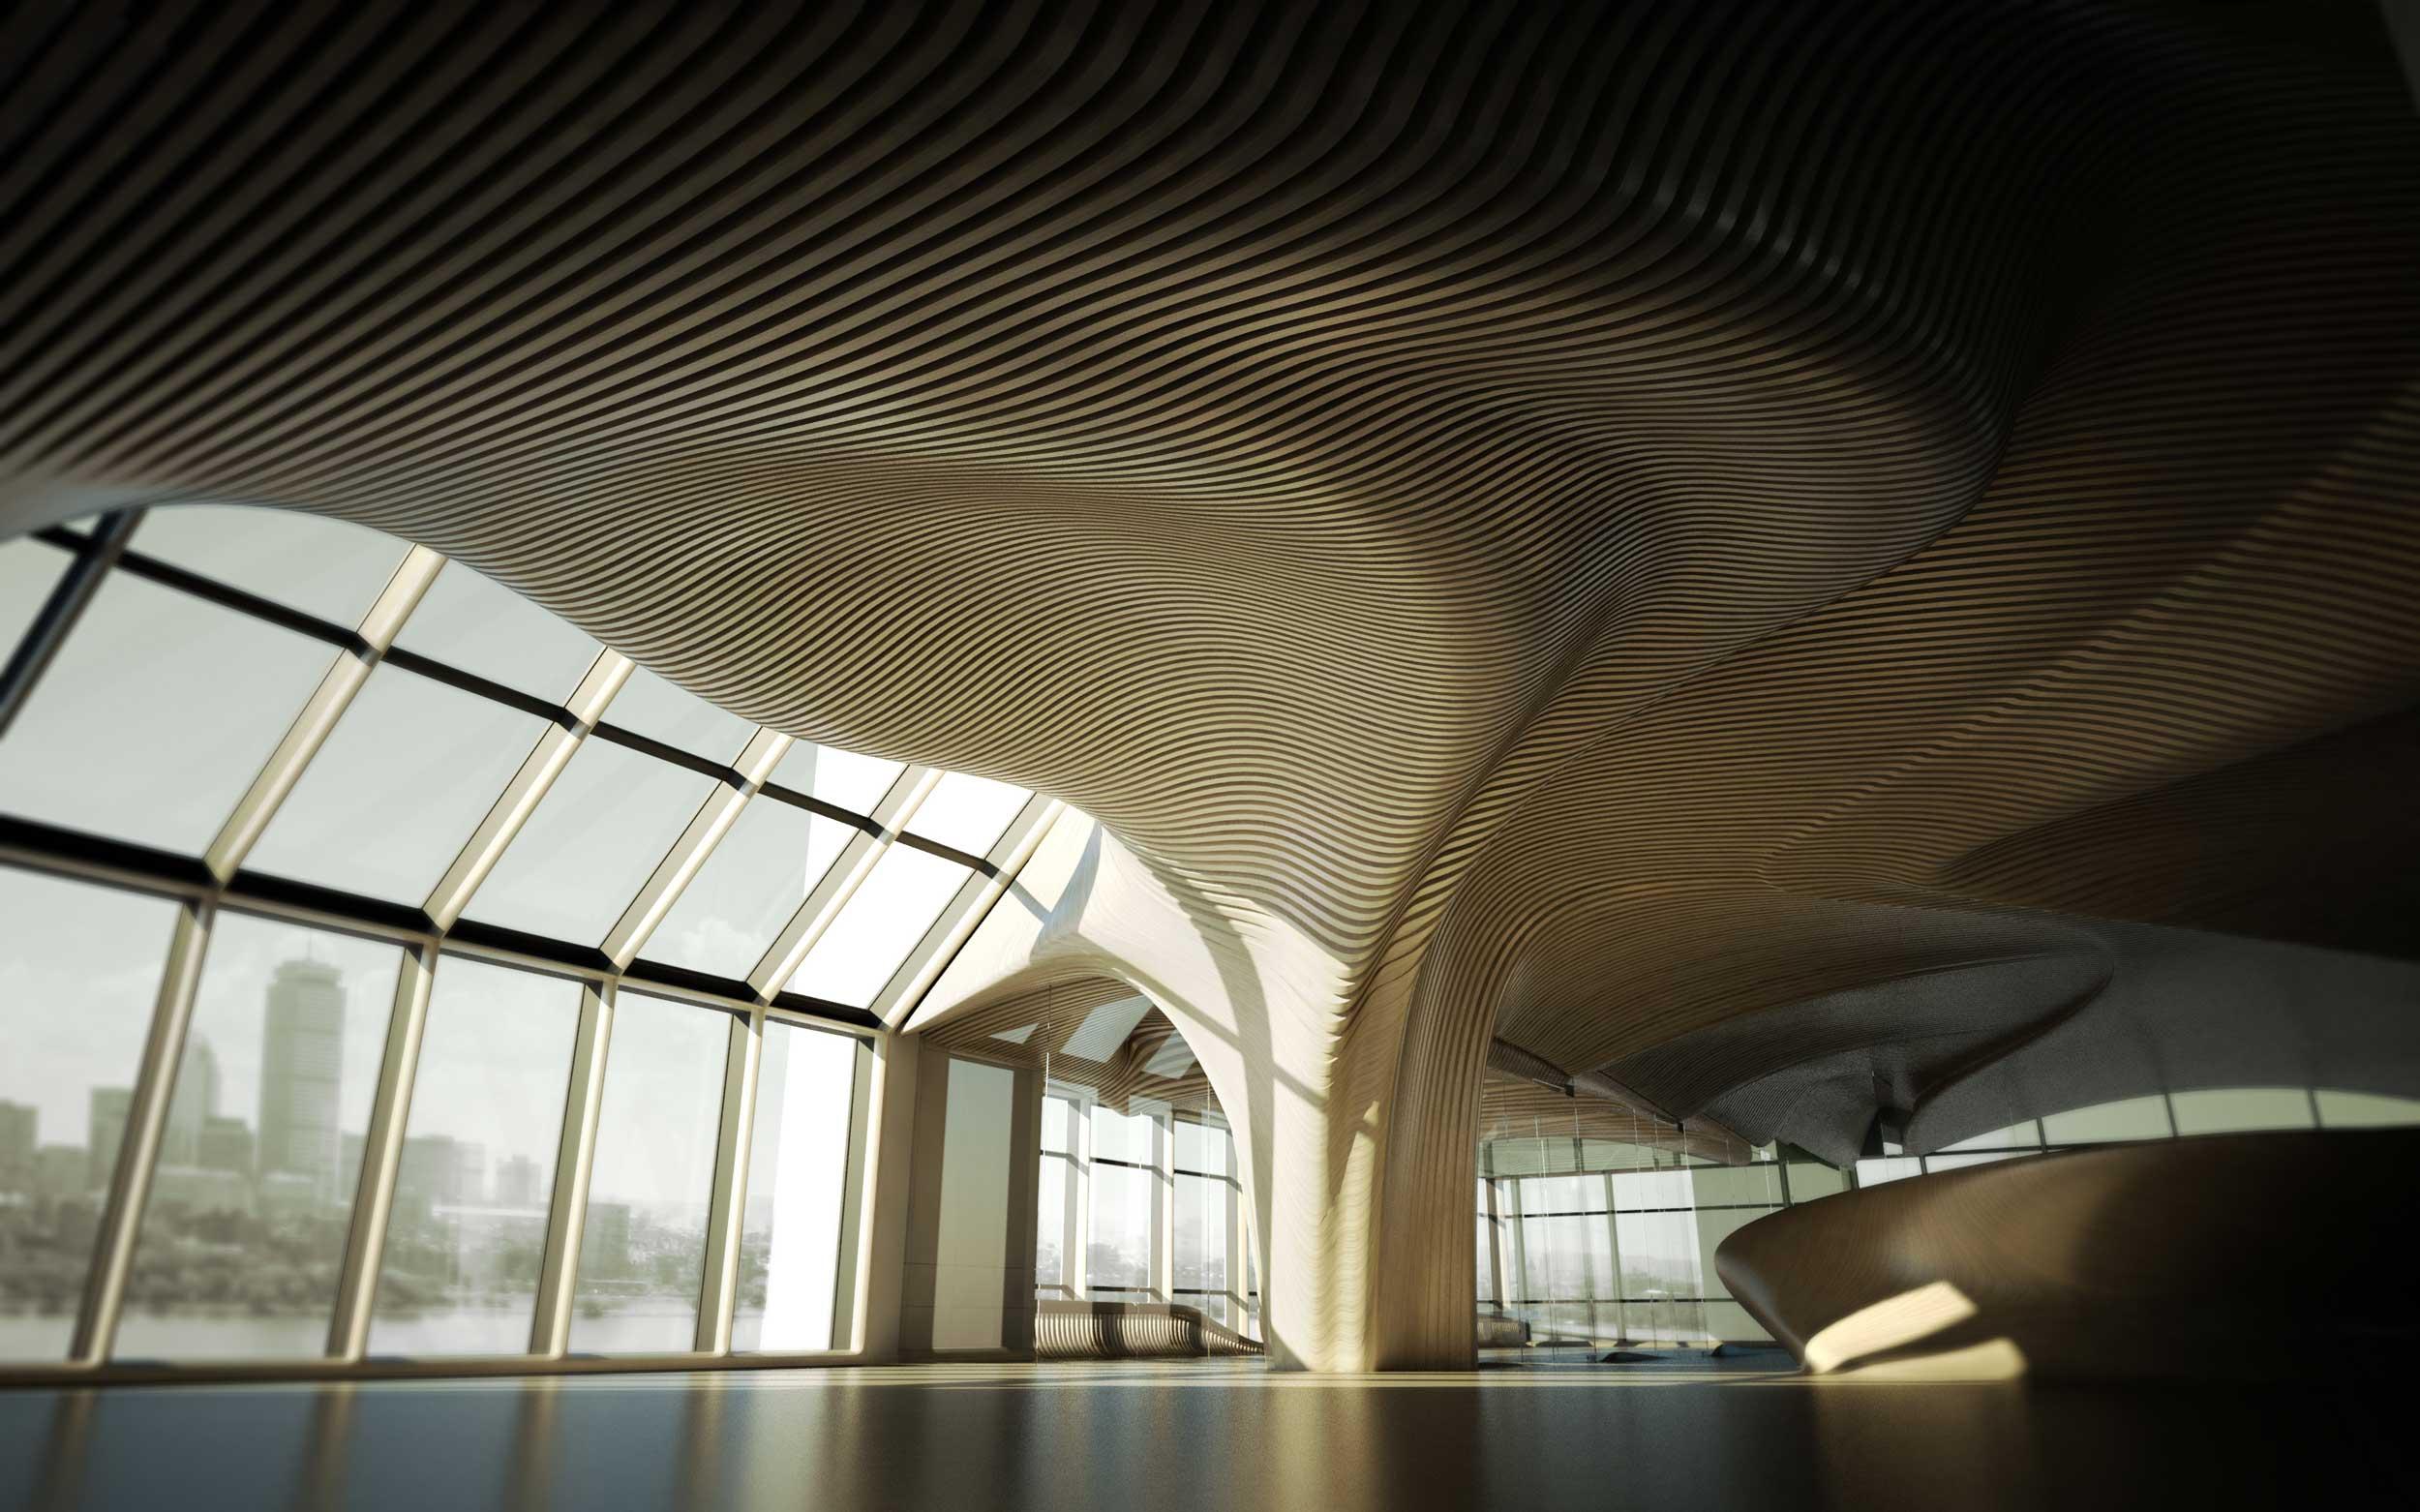 One main decoi architects. Sustainability and digital fabrication